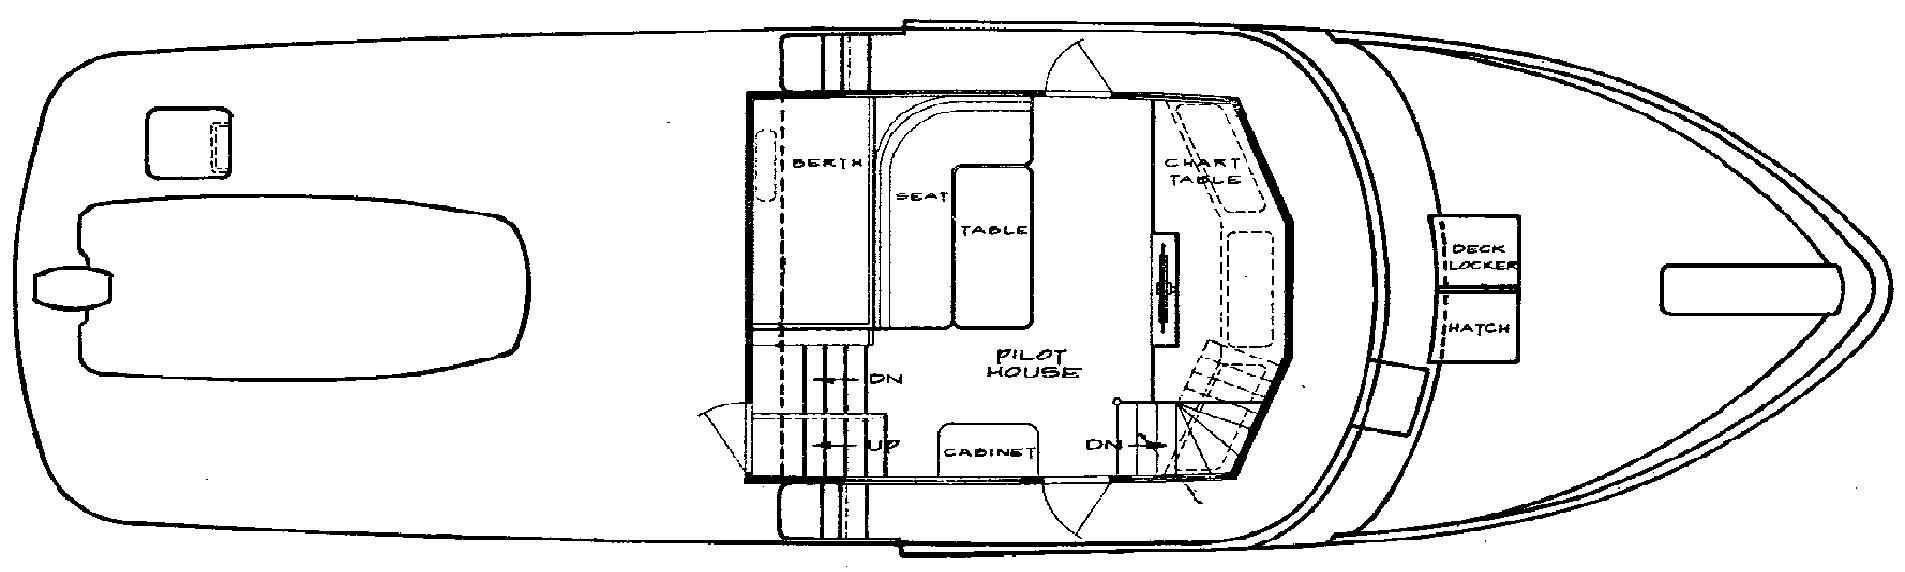 49 Pilothouse (Hard Chine) Floor Plan 2